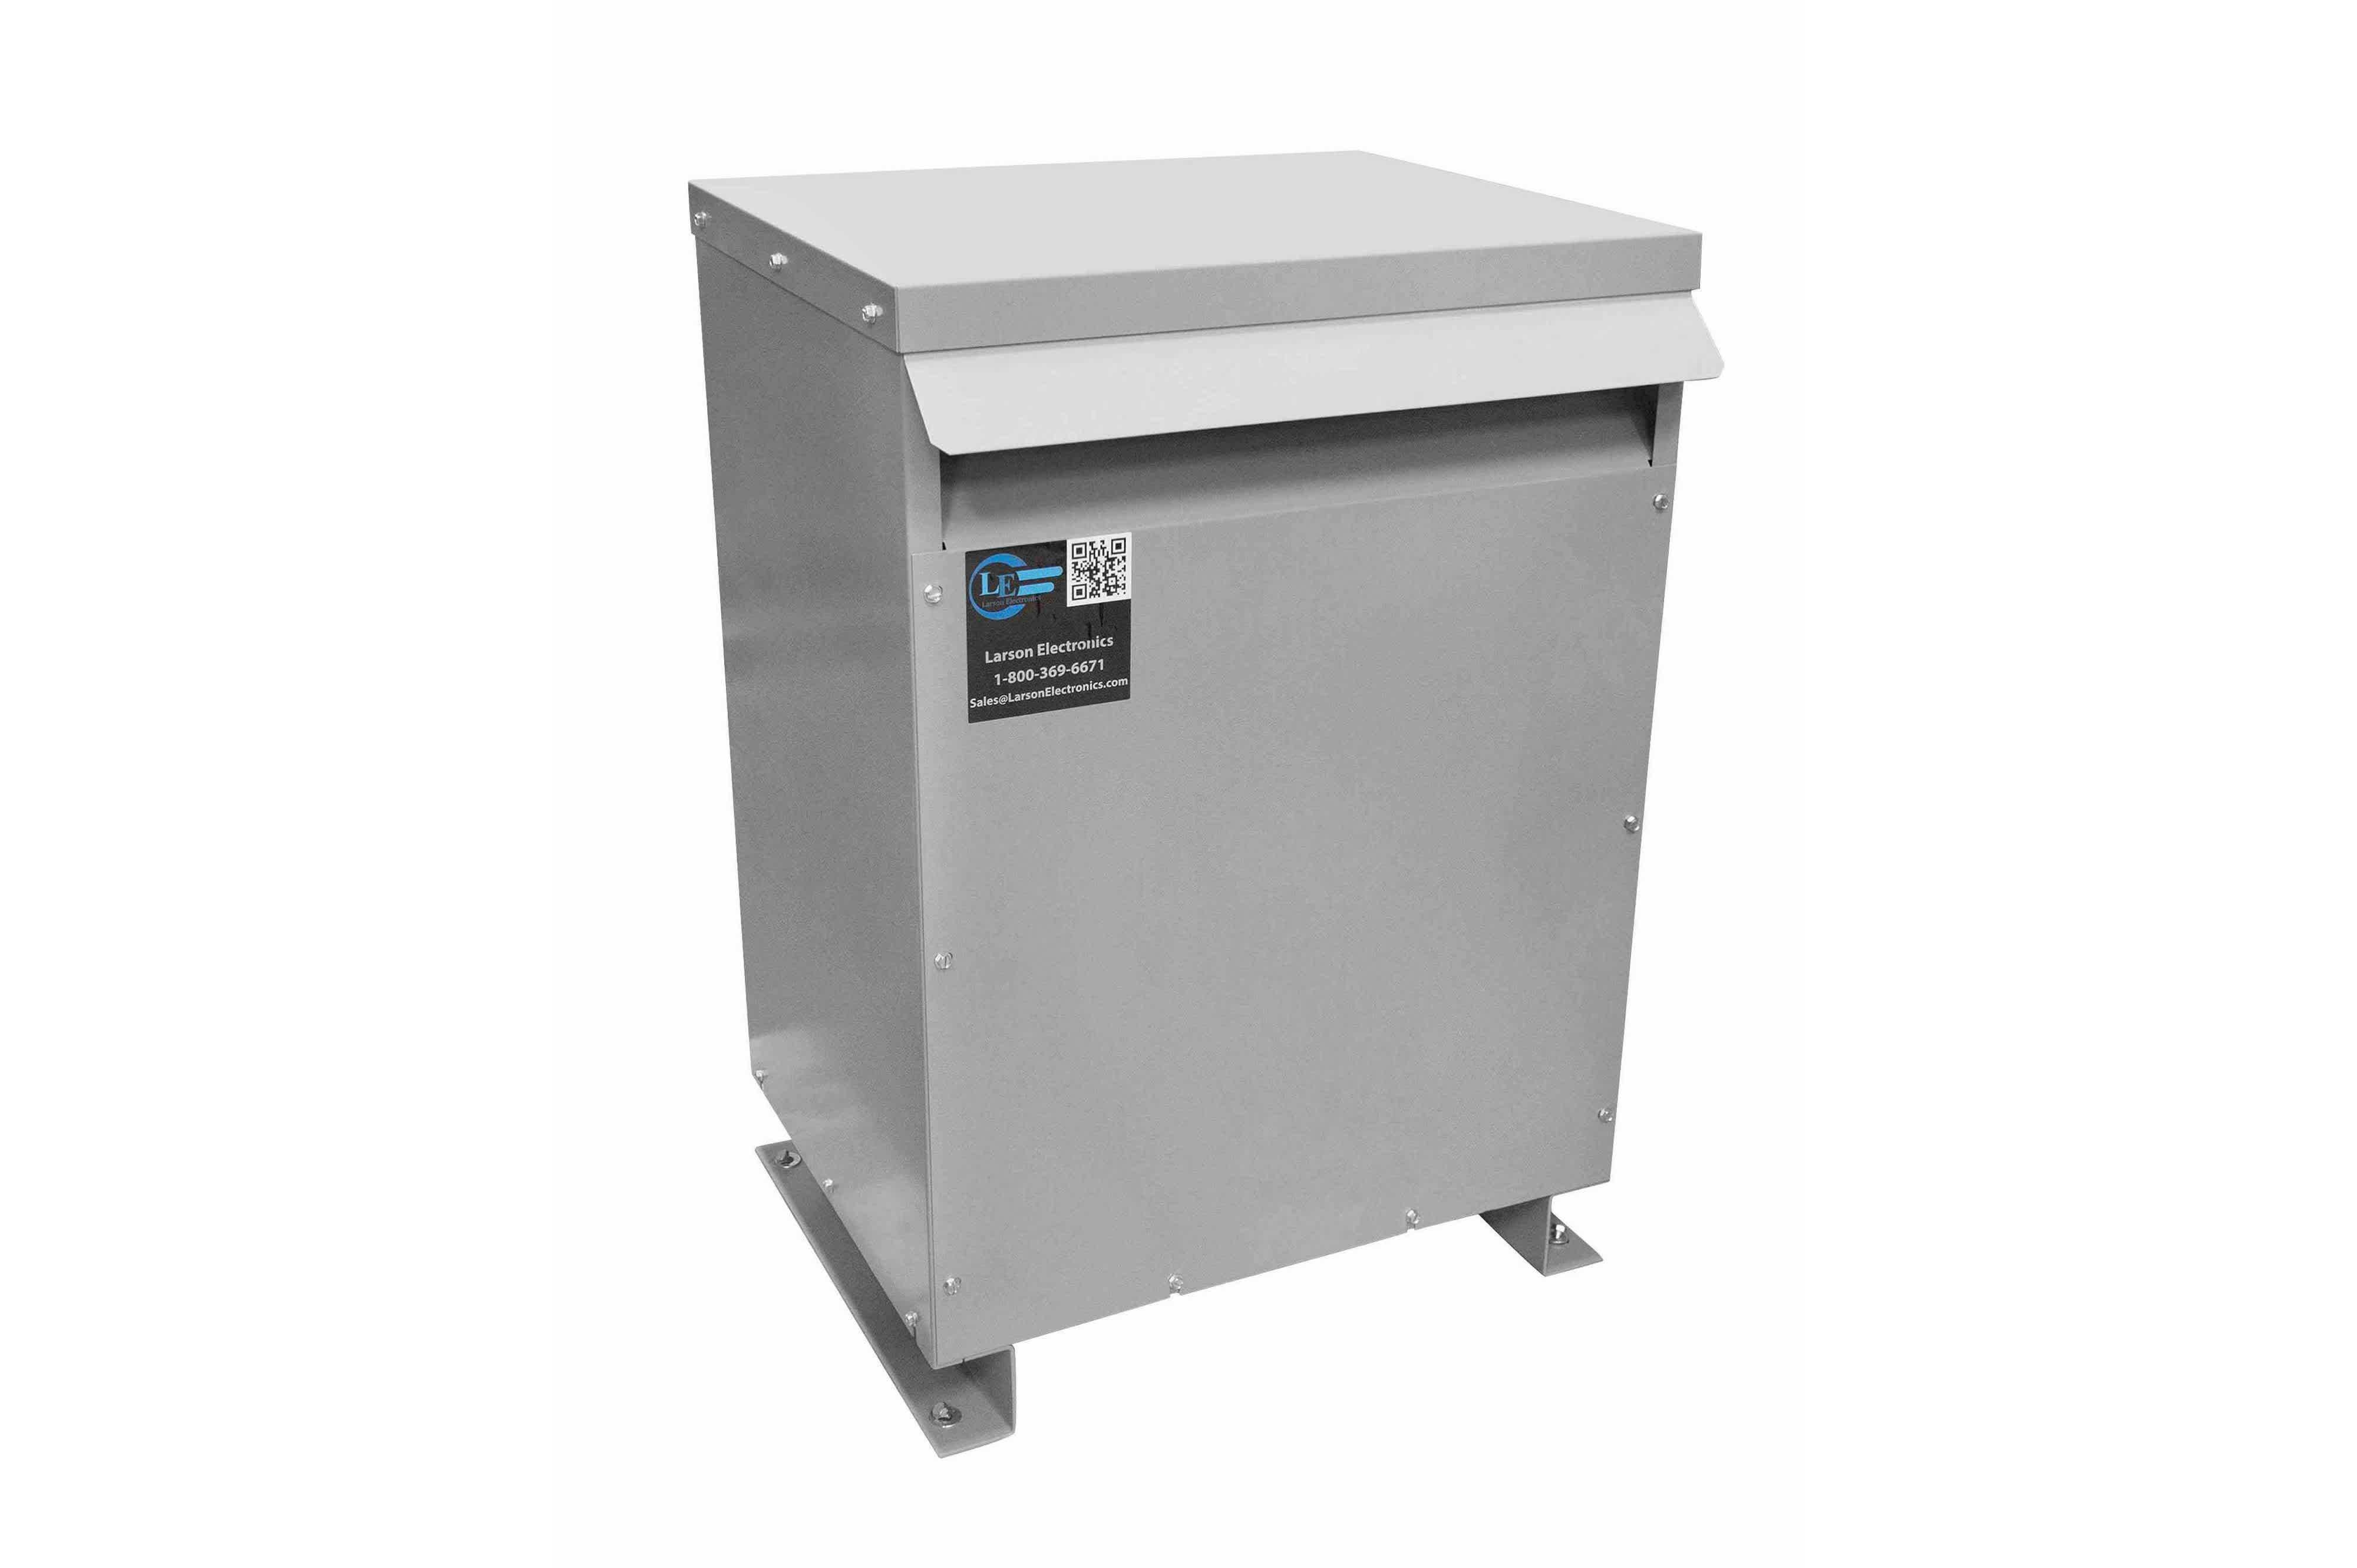 150 kVA 3PH DOE Transformer, 220V Delta Primary, 480Y/277 Wye-N Secondary, N3R, Ventilated, 60 Hz